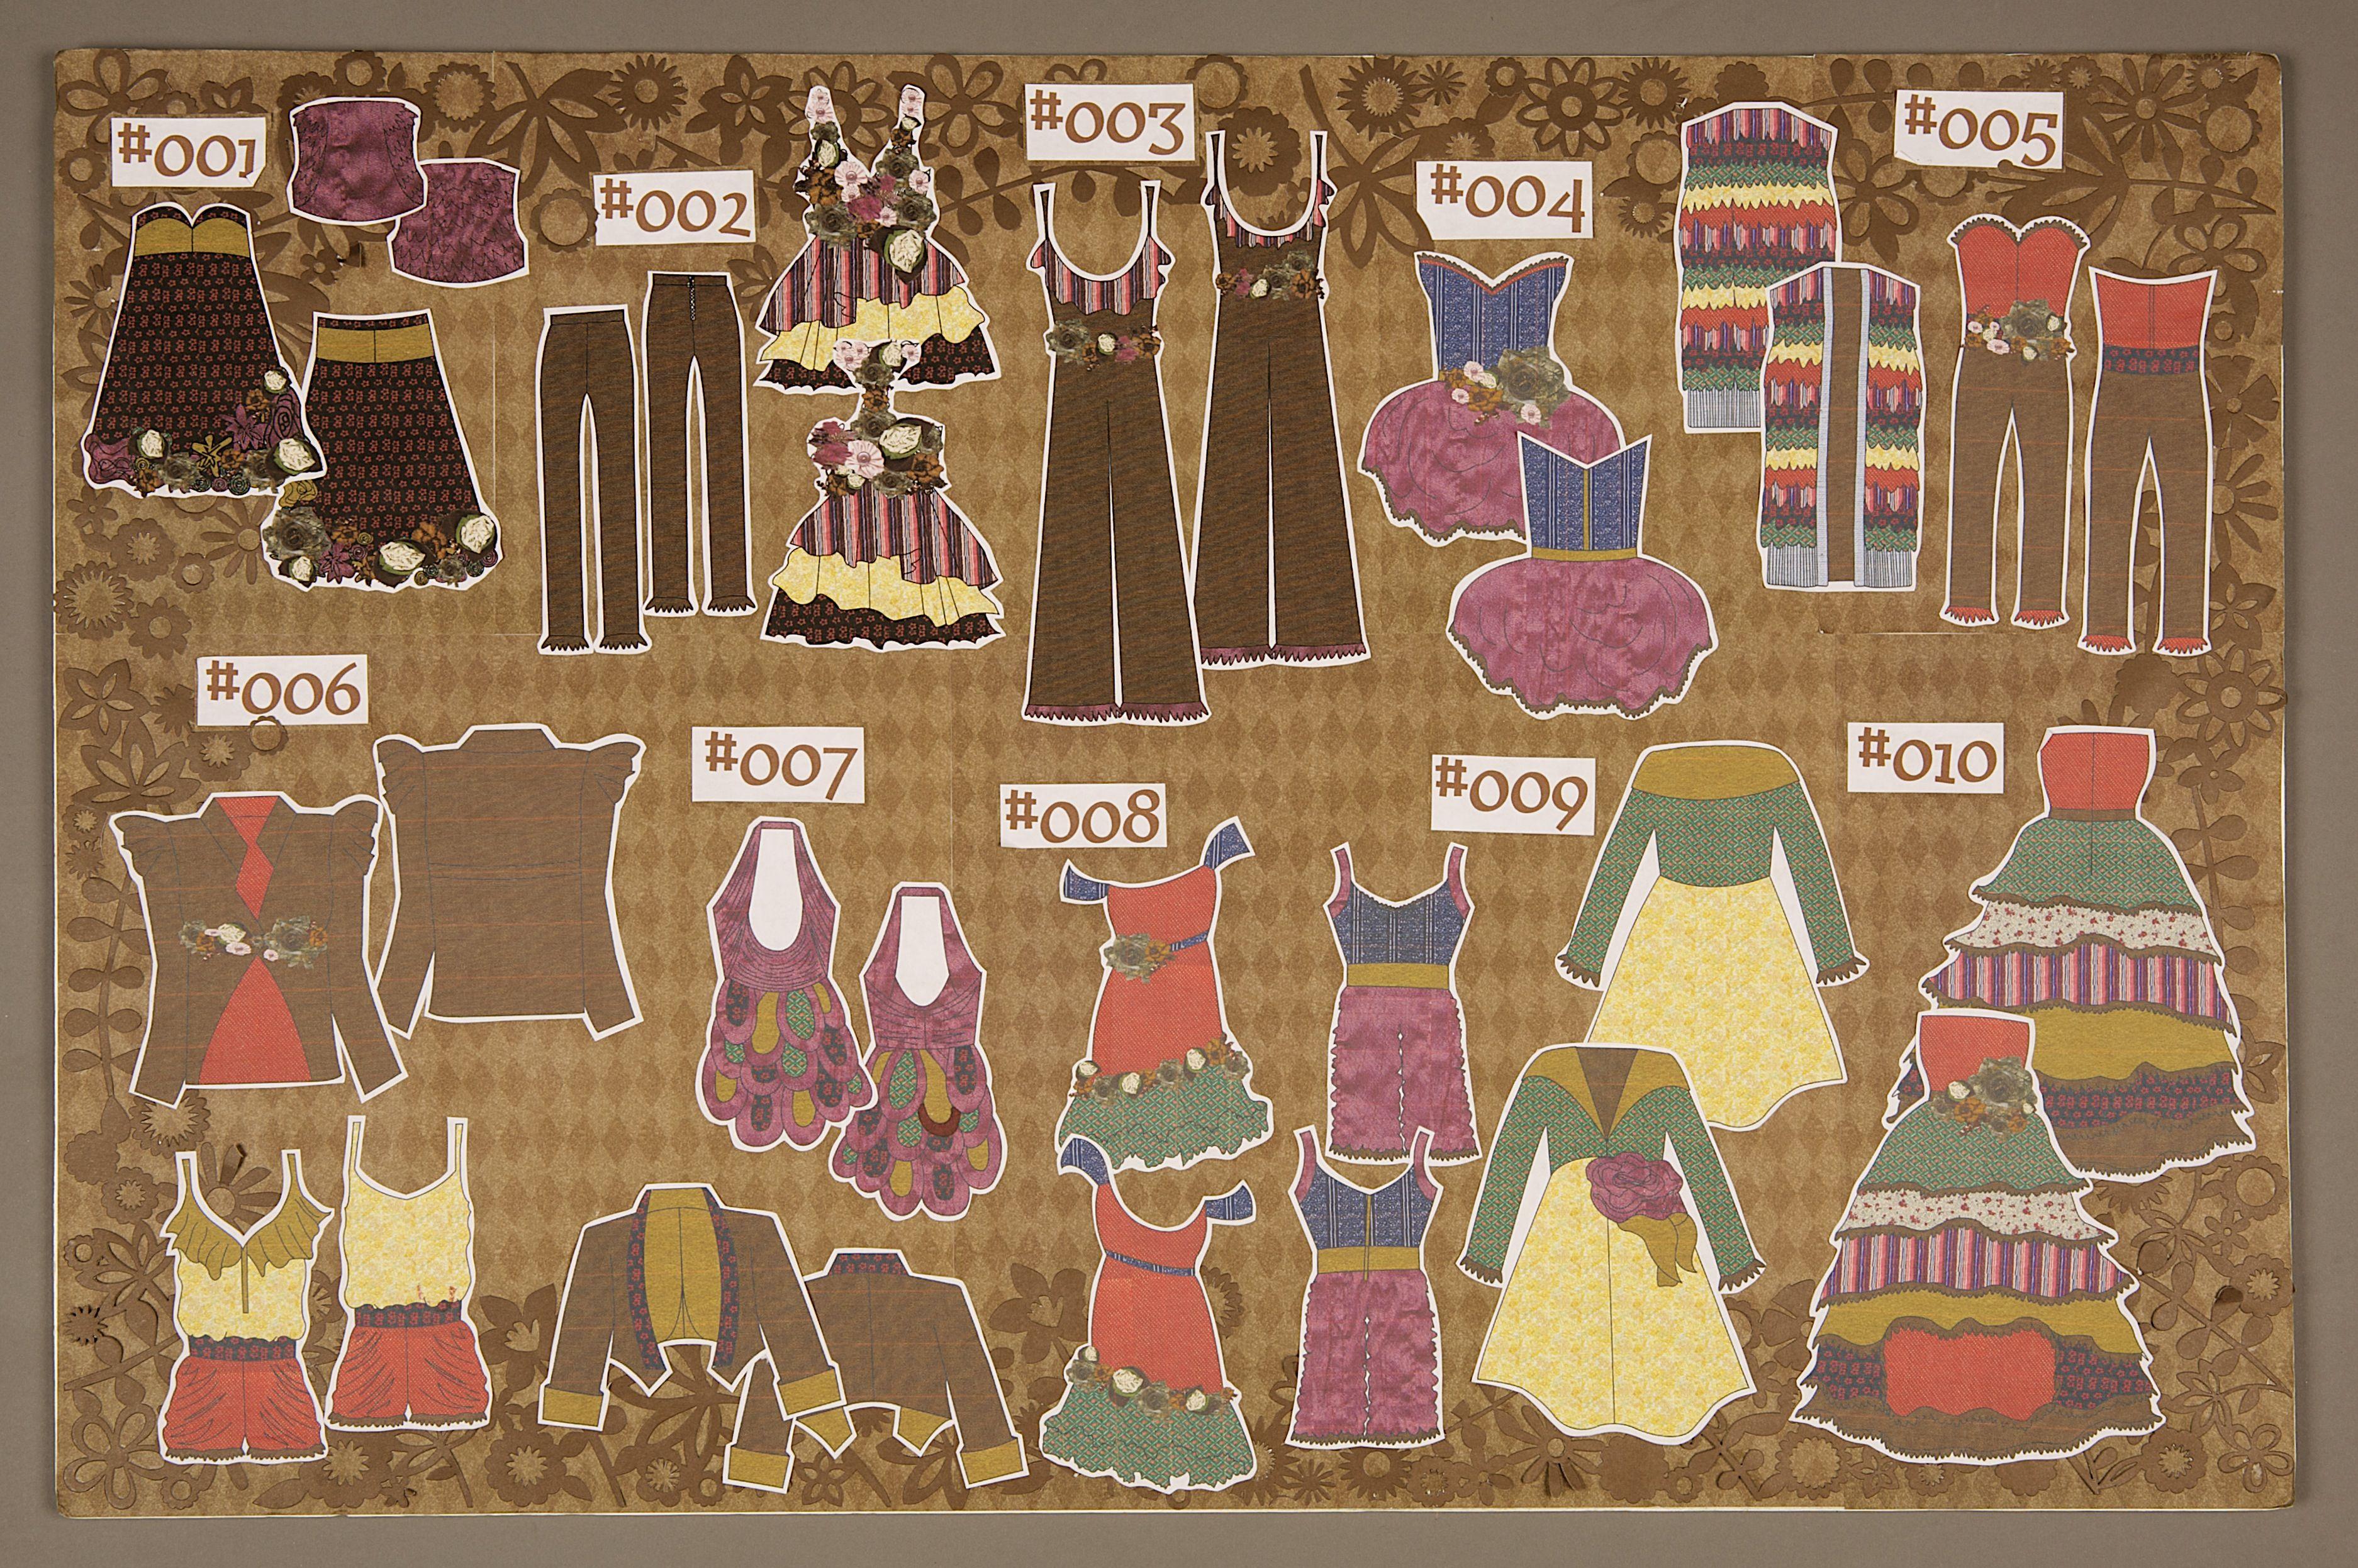 Senior Collection, Ashley Glading, 2010.